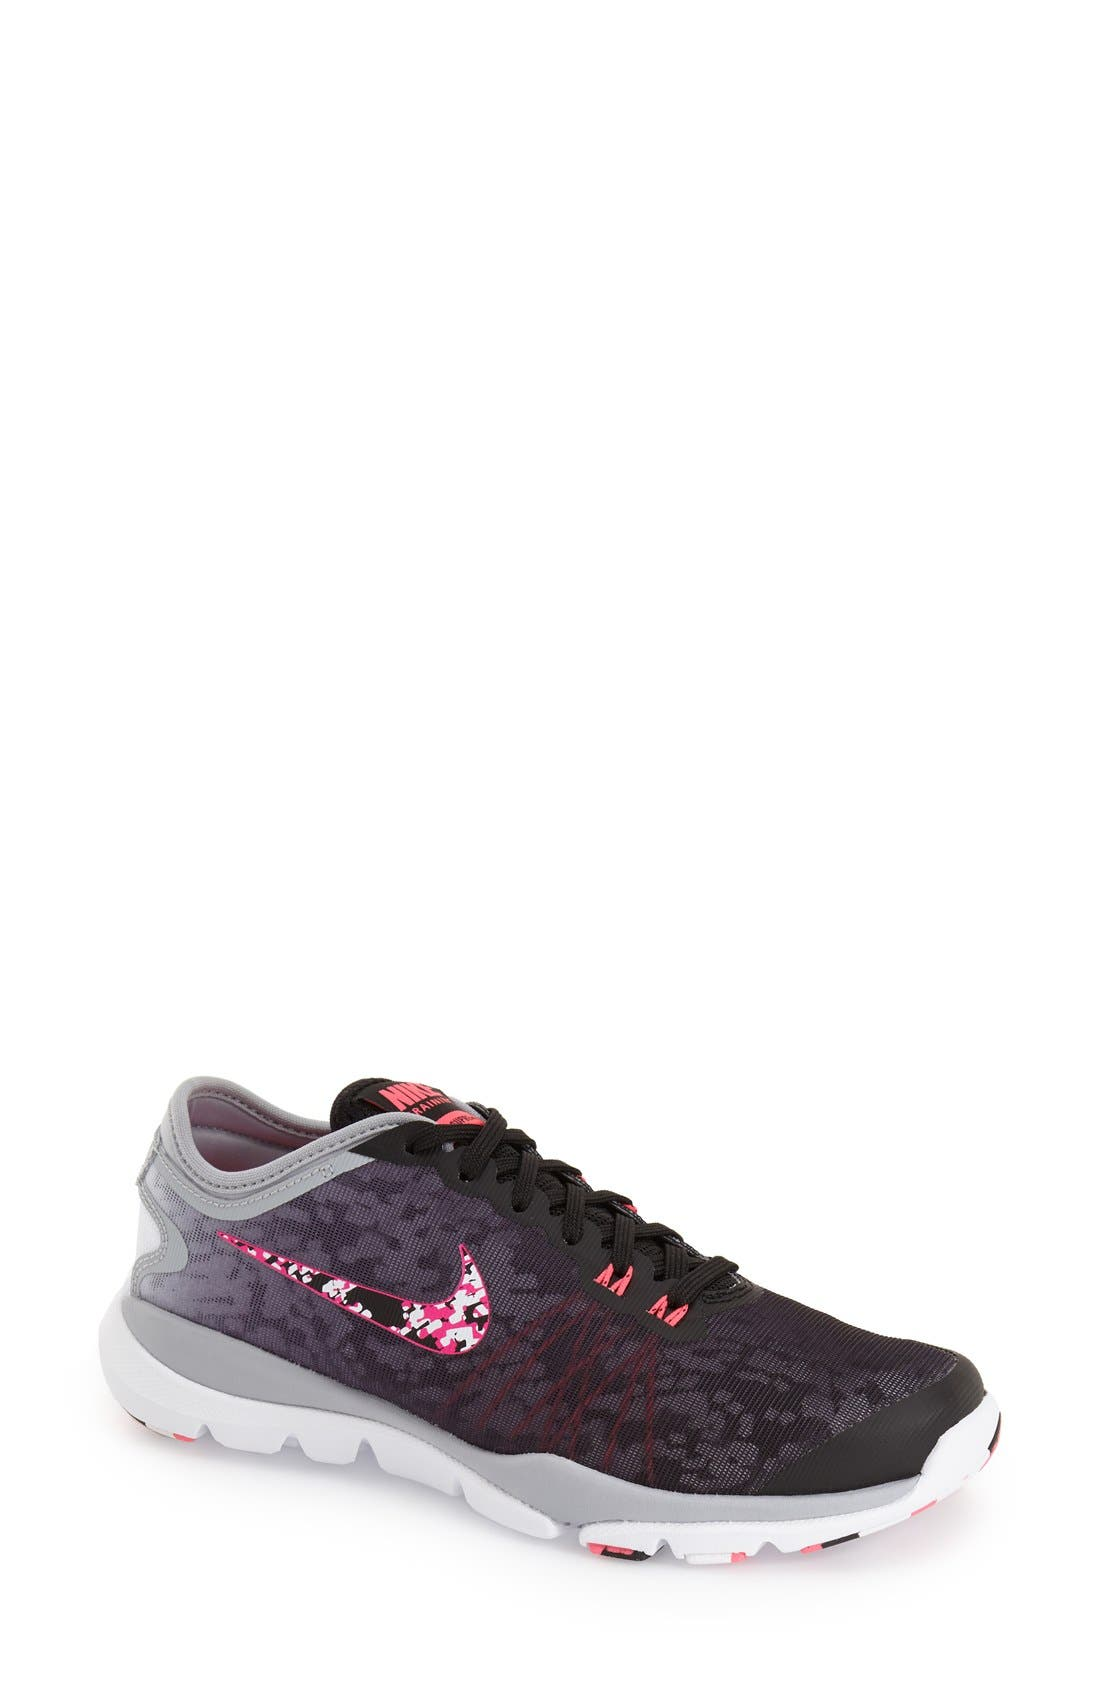 Main Image - Nike 'Flex Supreme' Training Shoe (Women)